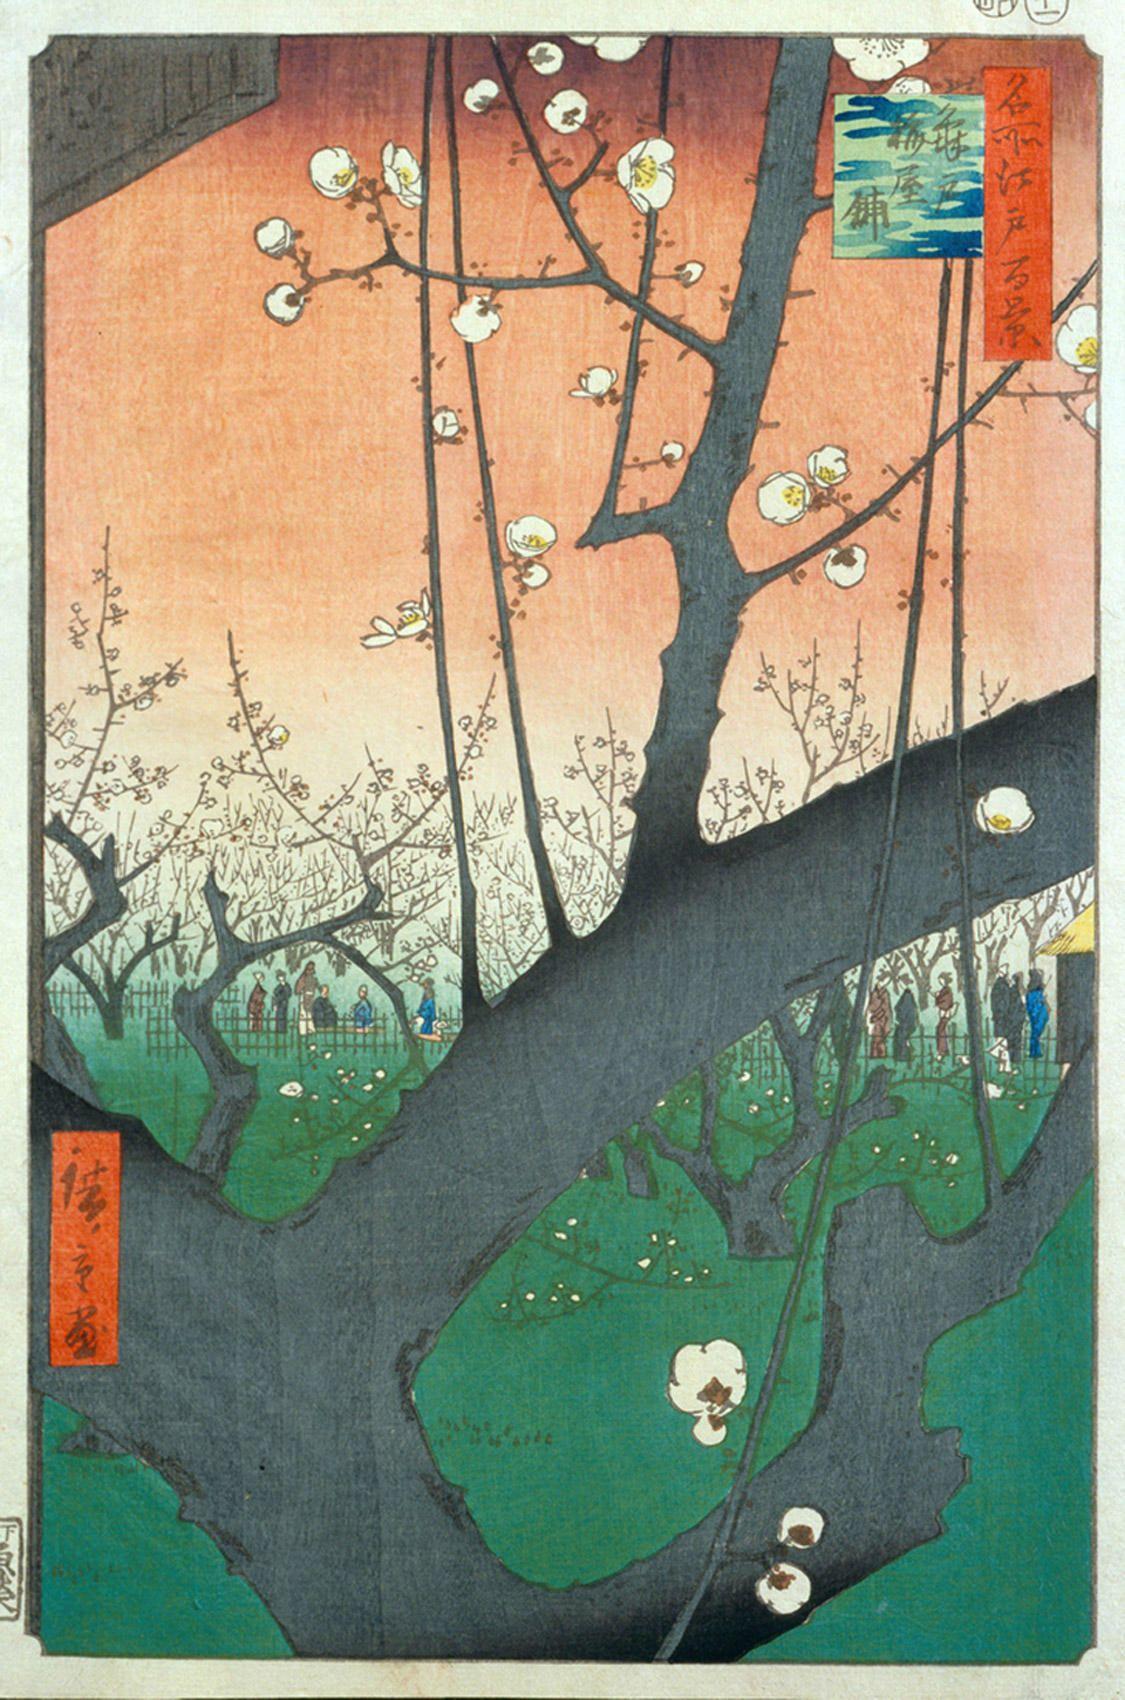 UTAGAWA HIROSHIGE The Plum Garden at Kameido from the series 100 Famous Views of Edo